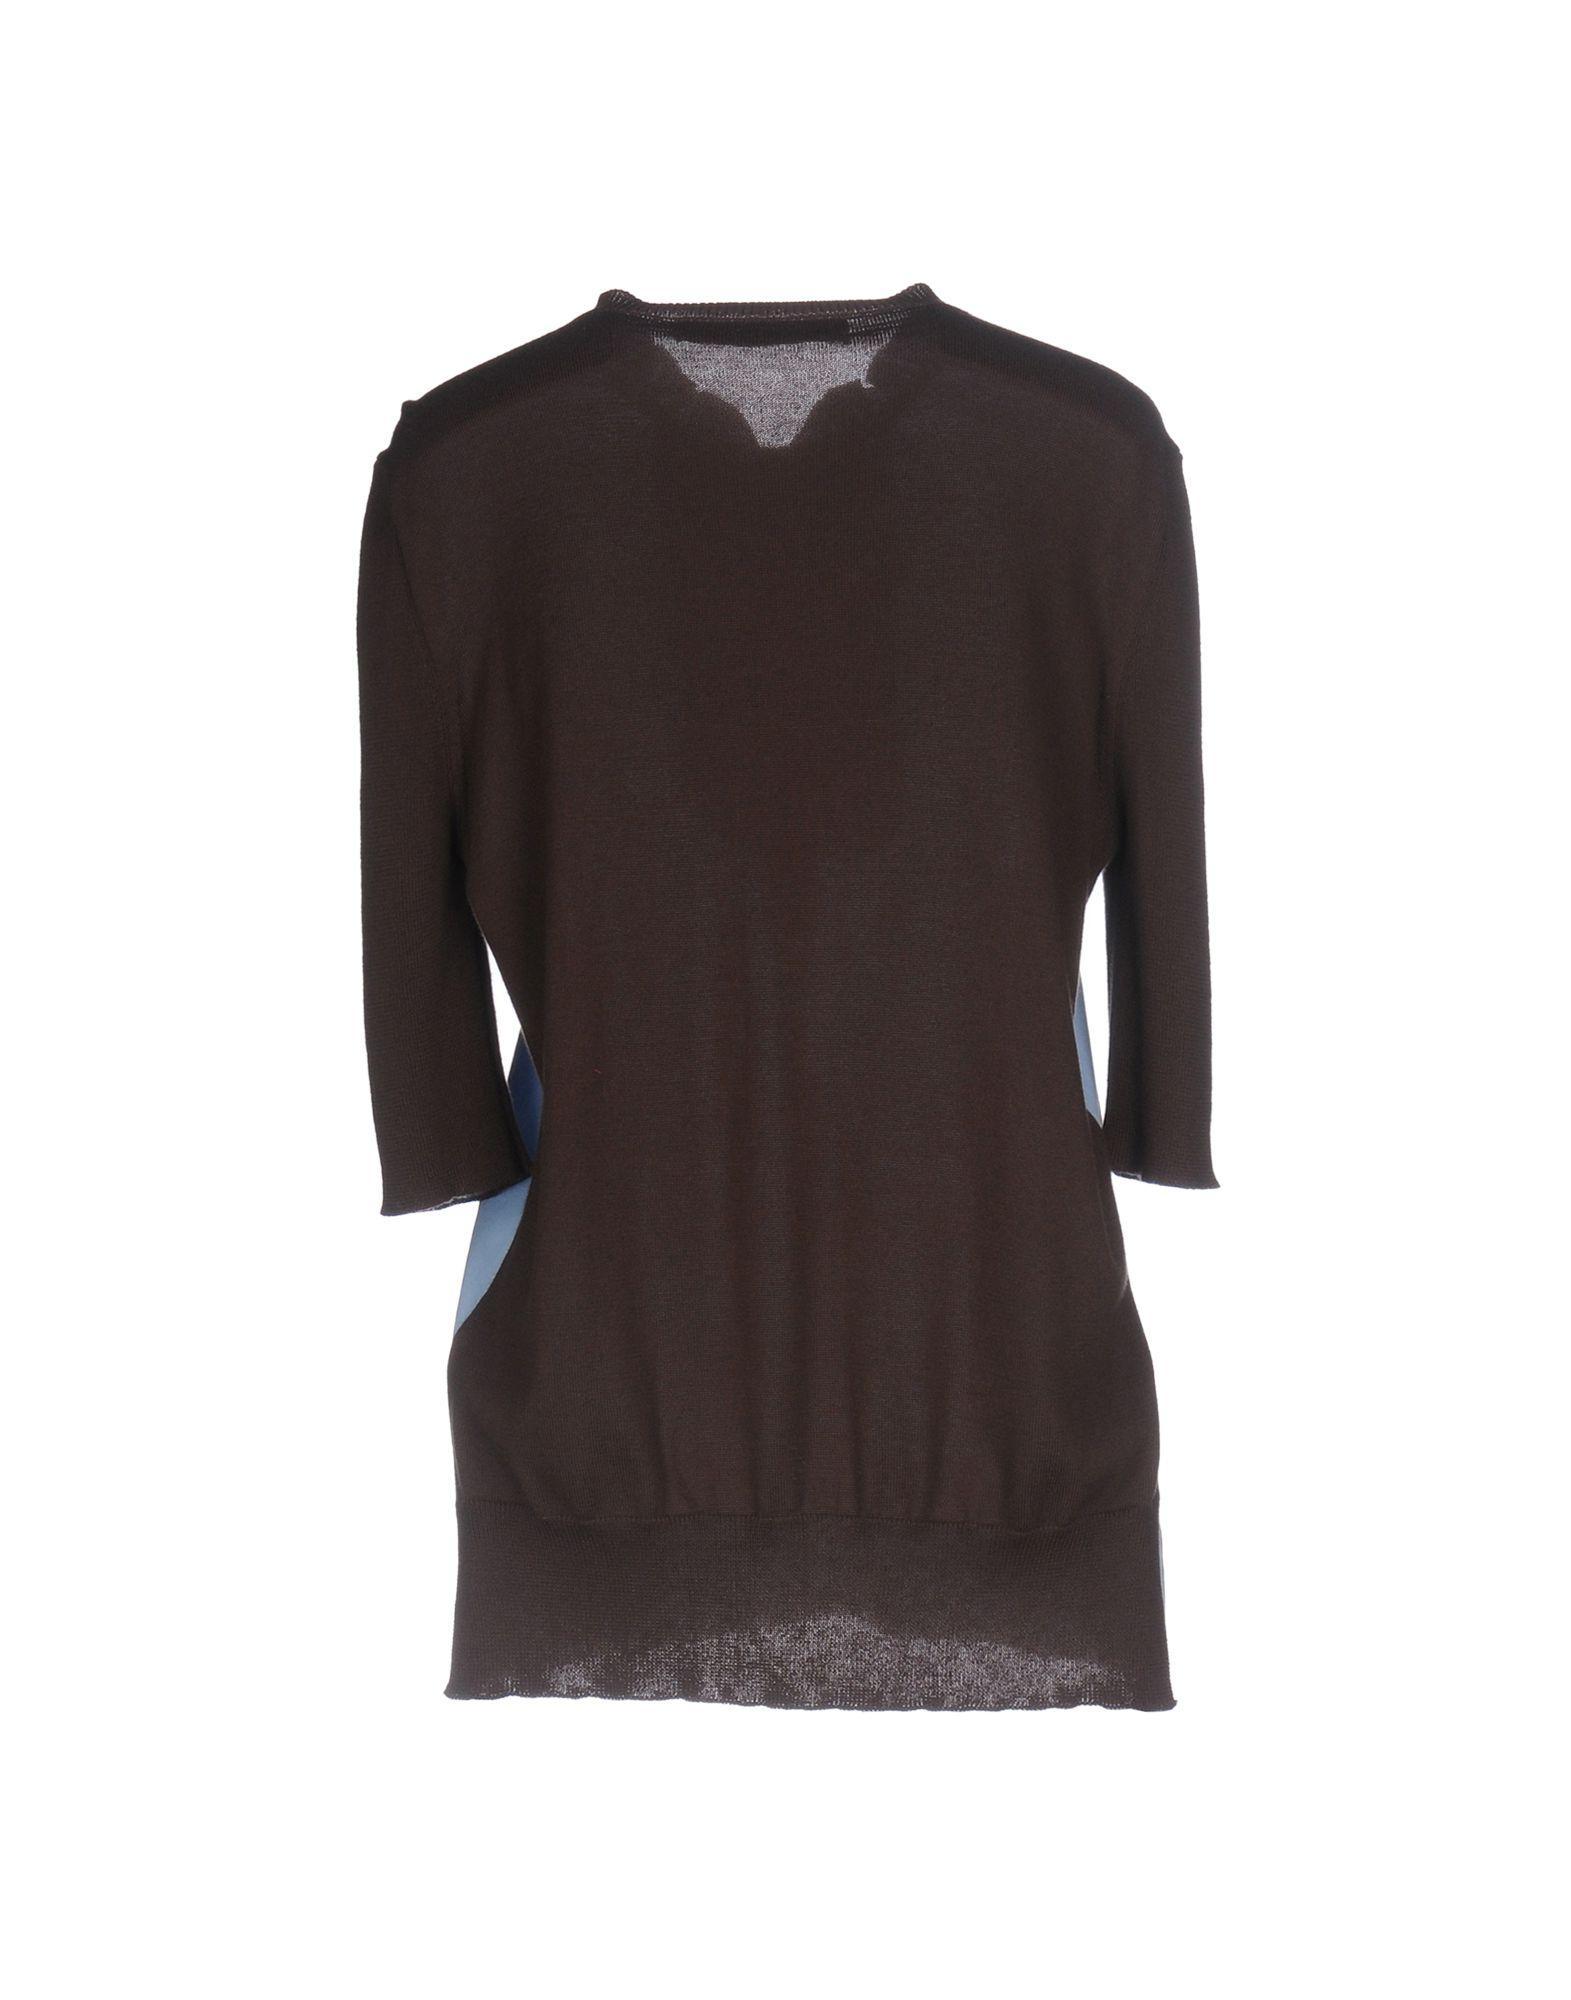 Marni Sweater in Blue